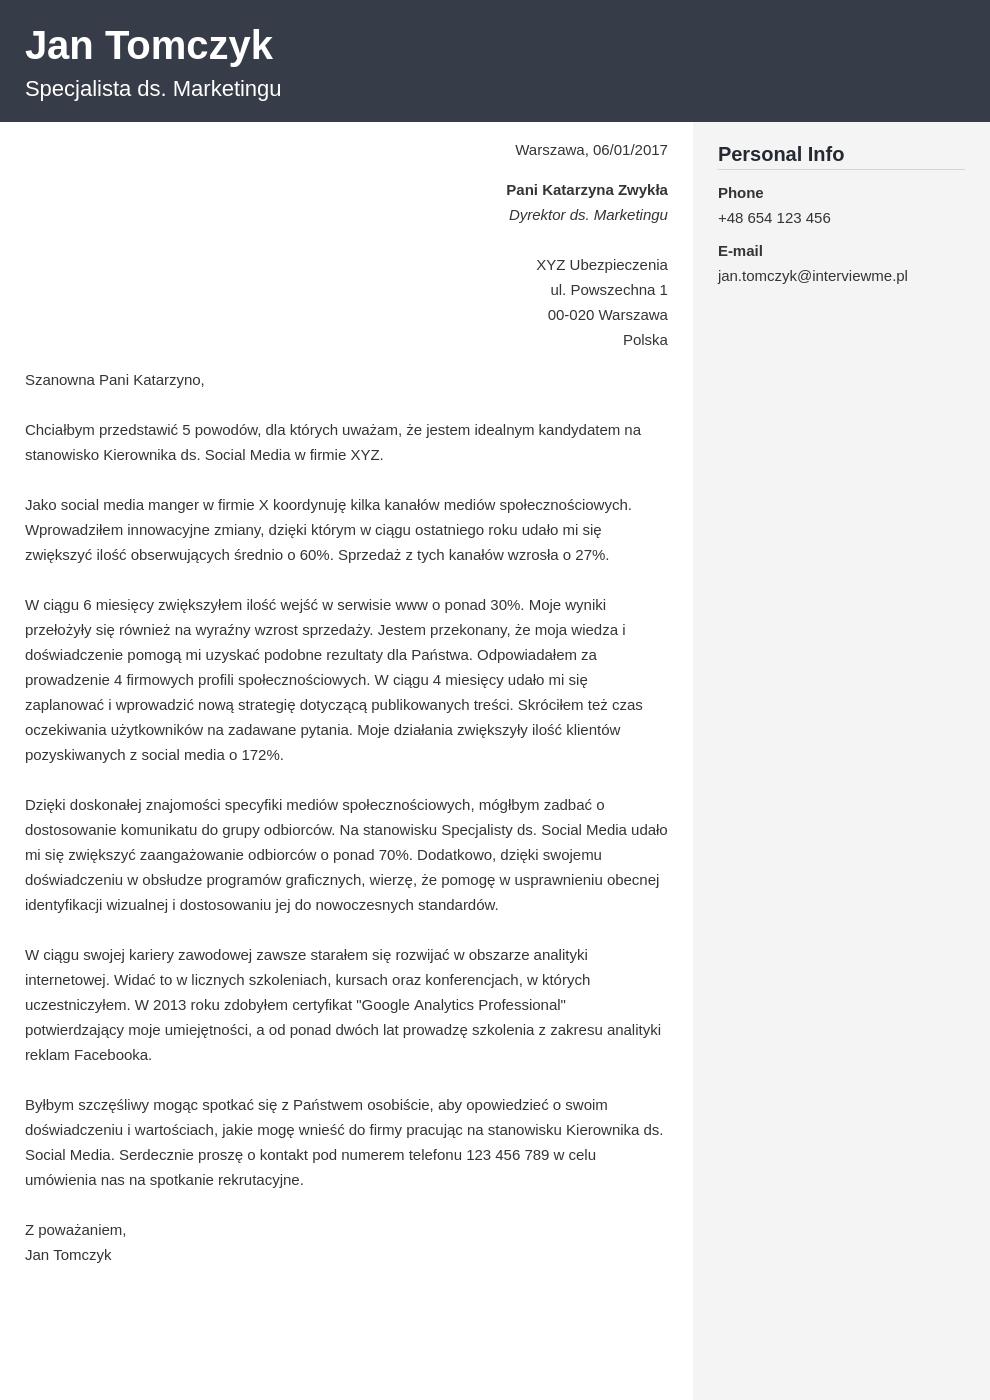 Szablon listu motywacyjnego Cubic